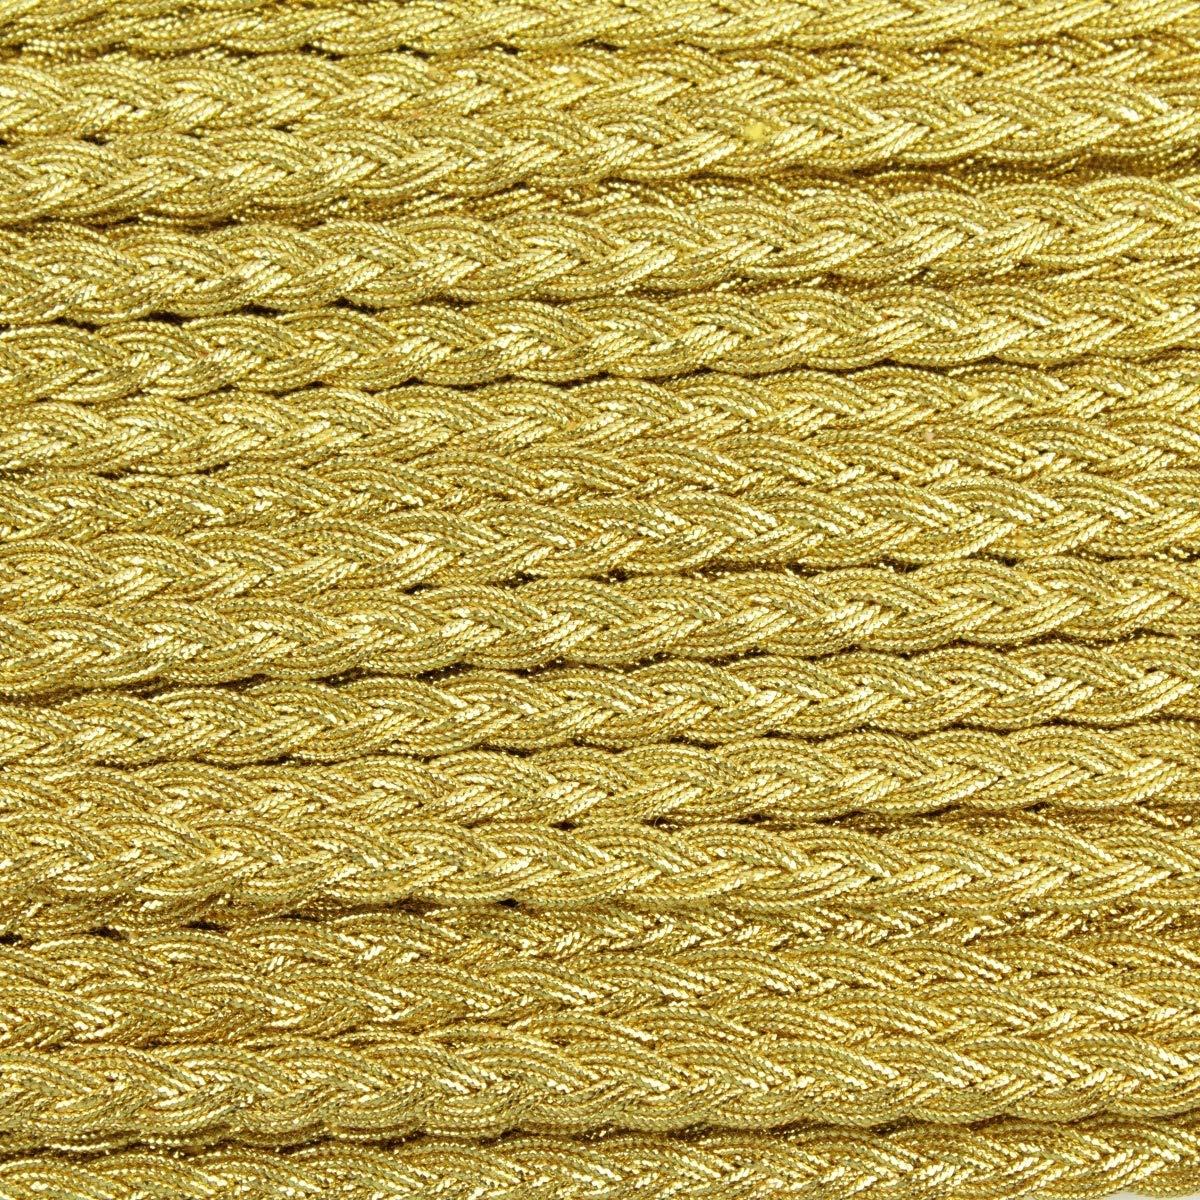 txxzn Almuerzo Caja Cartoon B/úho Almuerzo Caja Port/átil Bento Cajas De Comida para Ni/ños Escuela Termo para Comida Picnic Set Amarillo